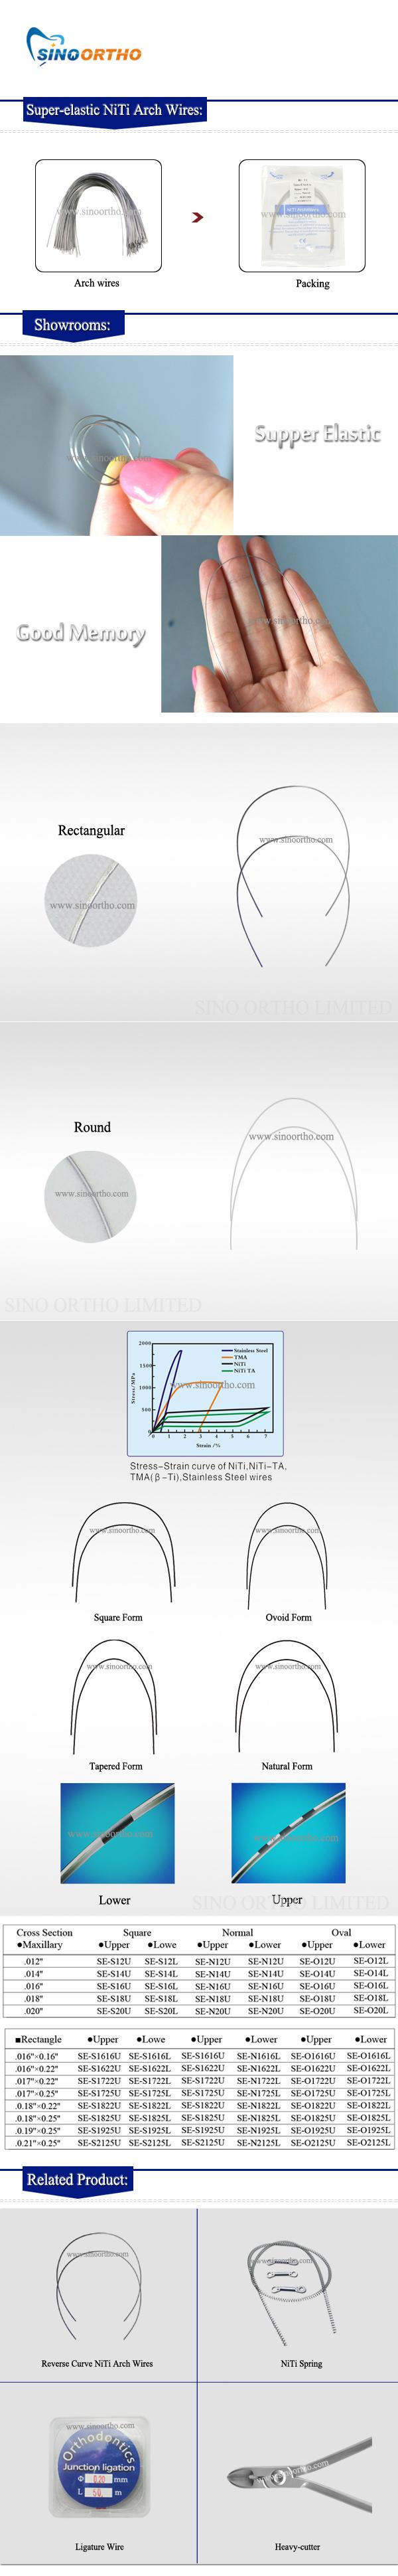 super-elastic-Niti-Arch-Wires